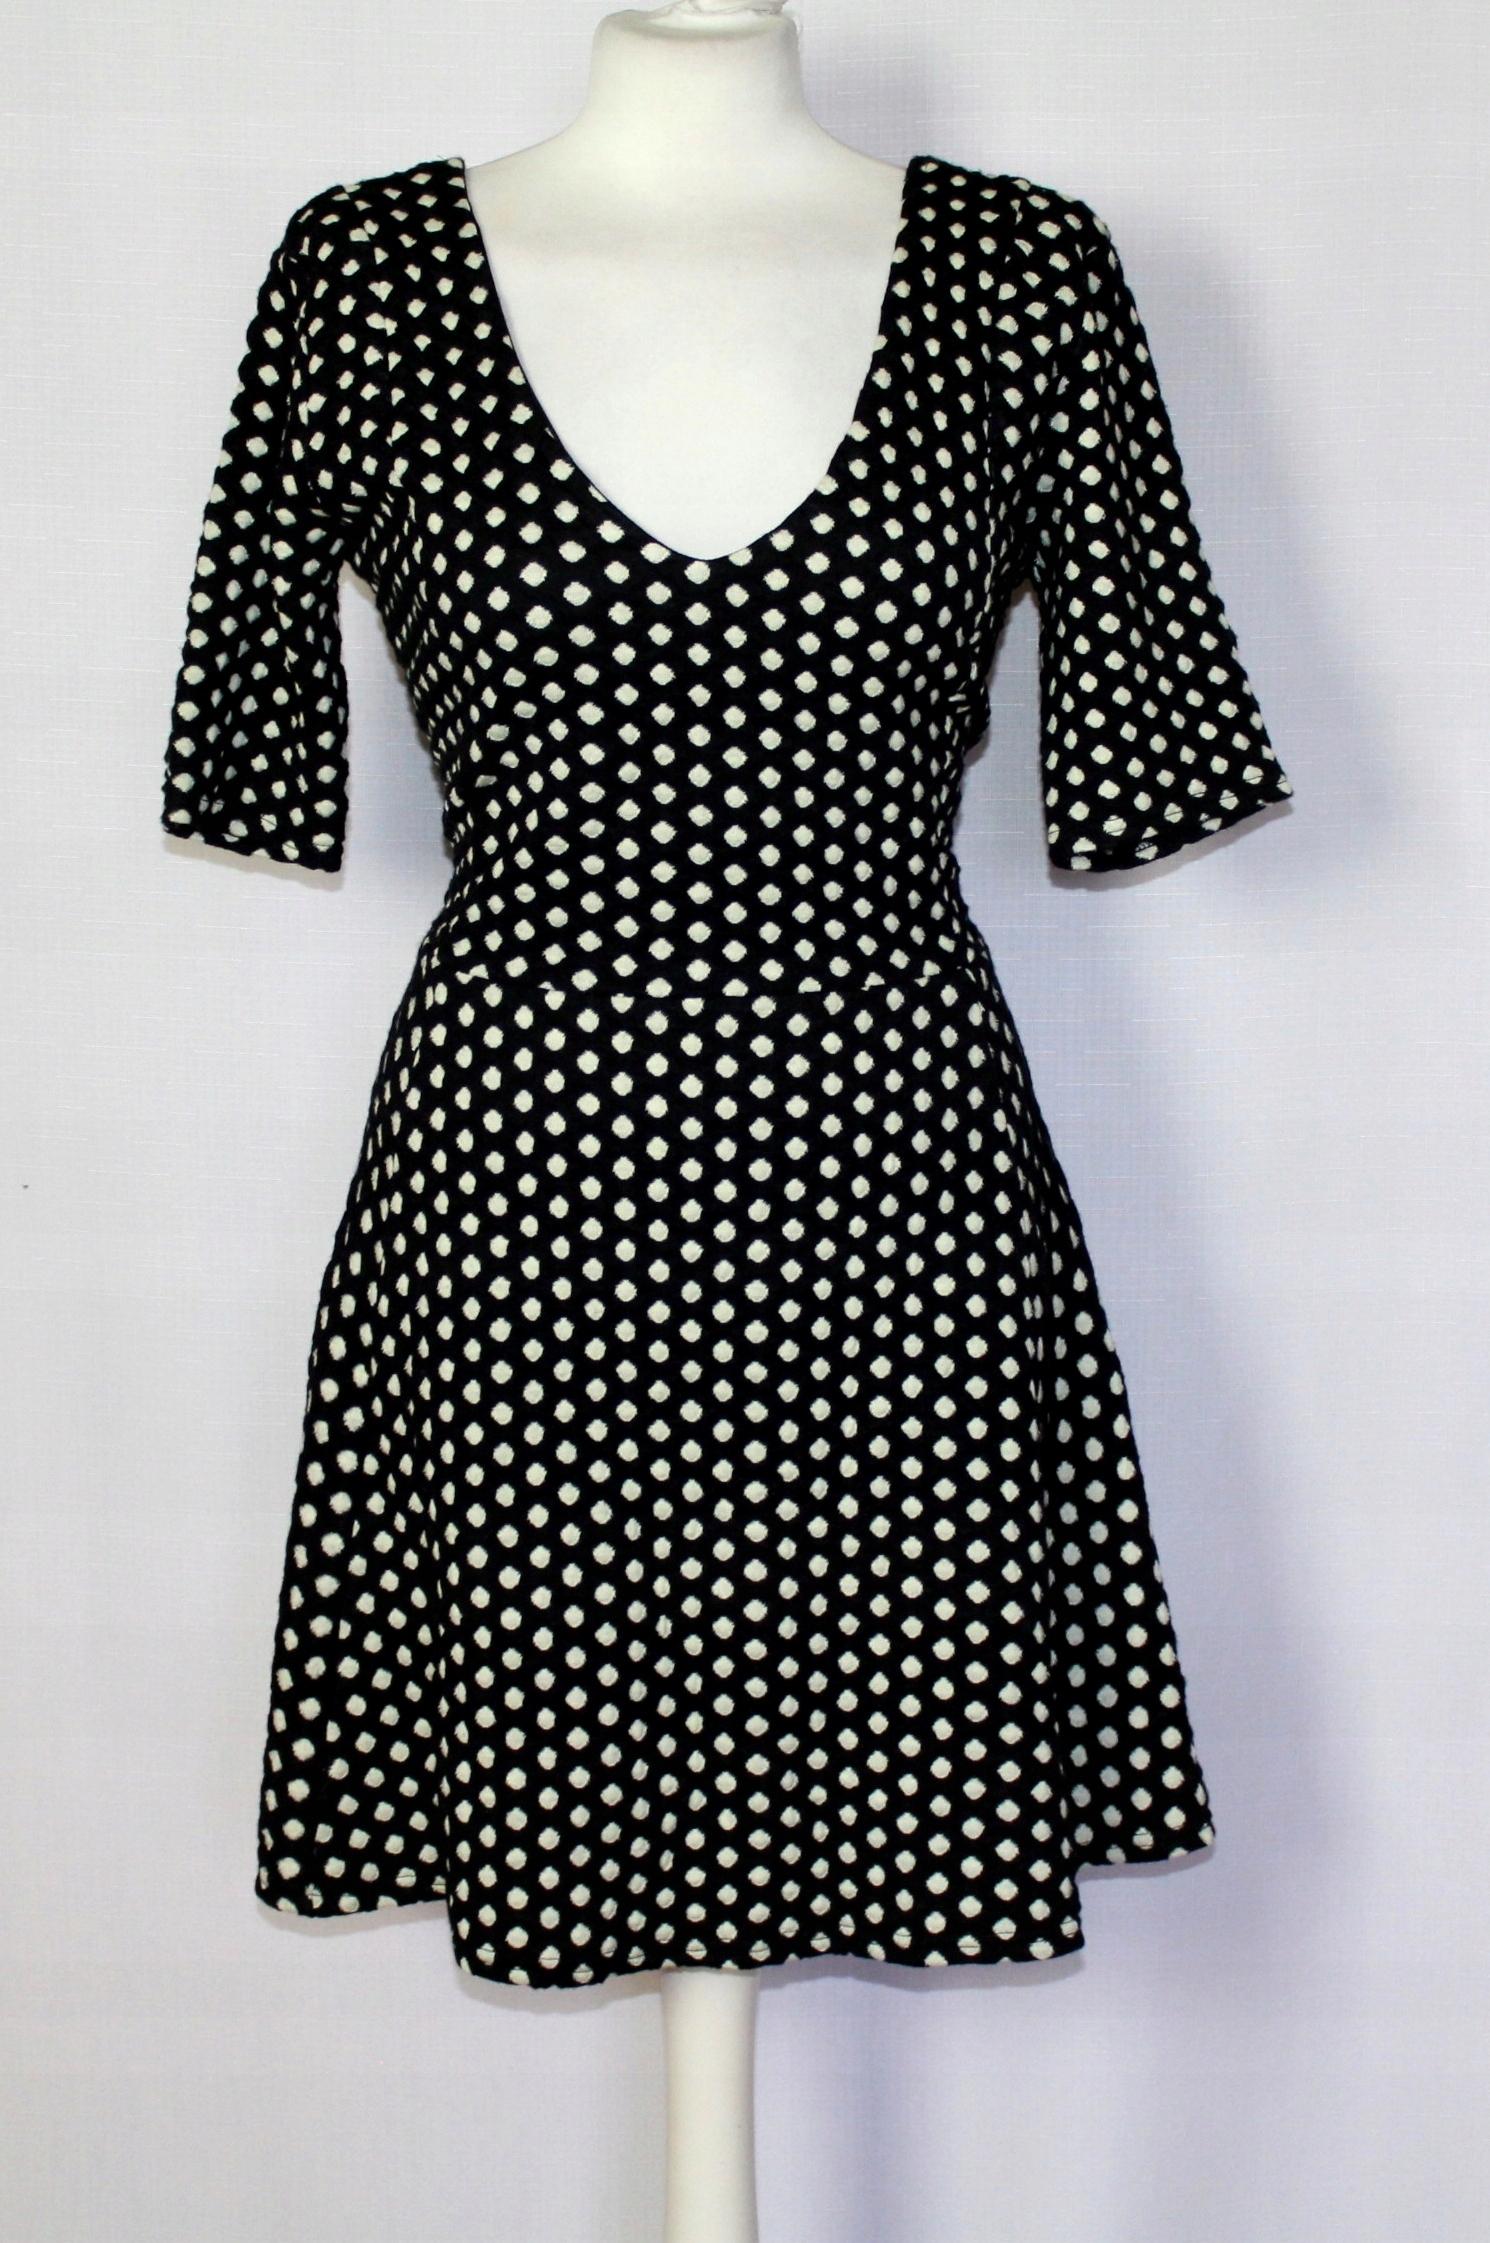 330e4ea20e Czarna sukienka w grochy pin-up girl 44 XXL 16 - 7559153587 ...